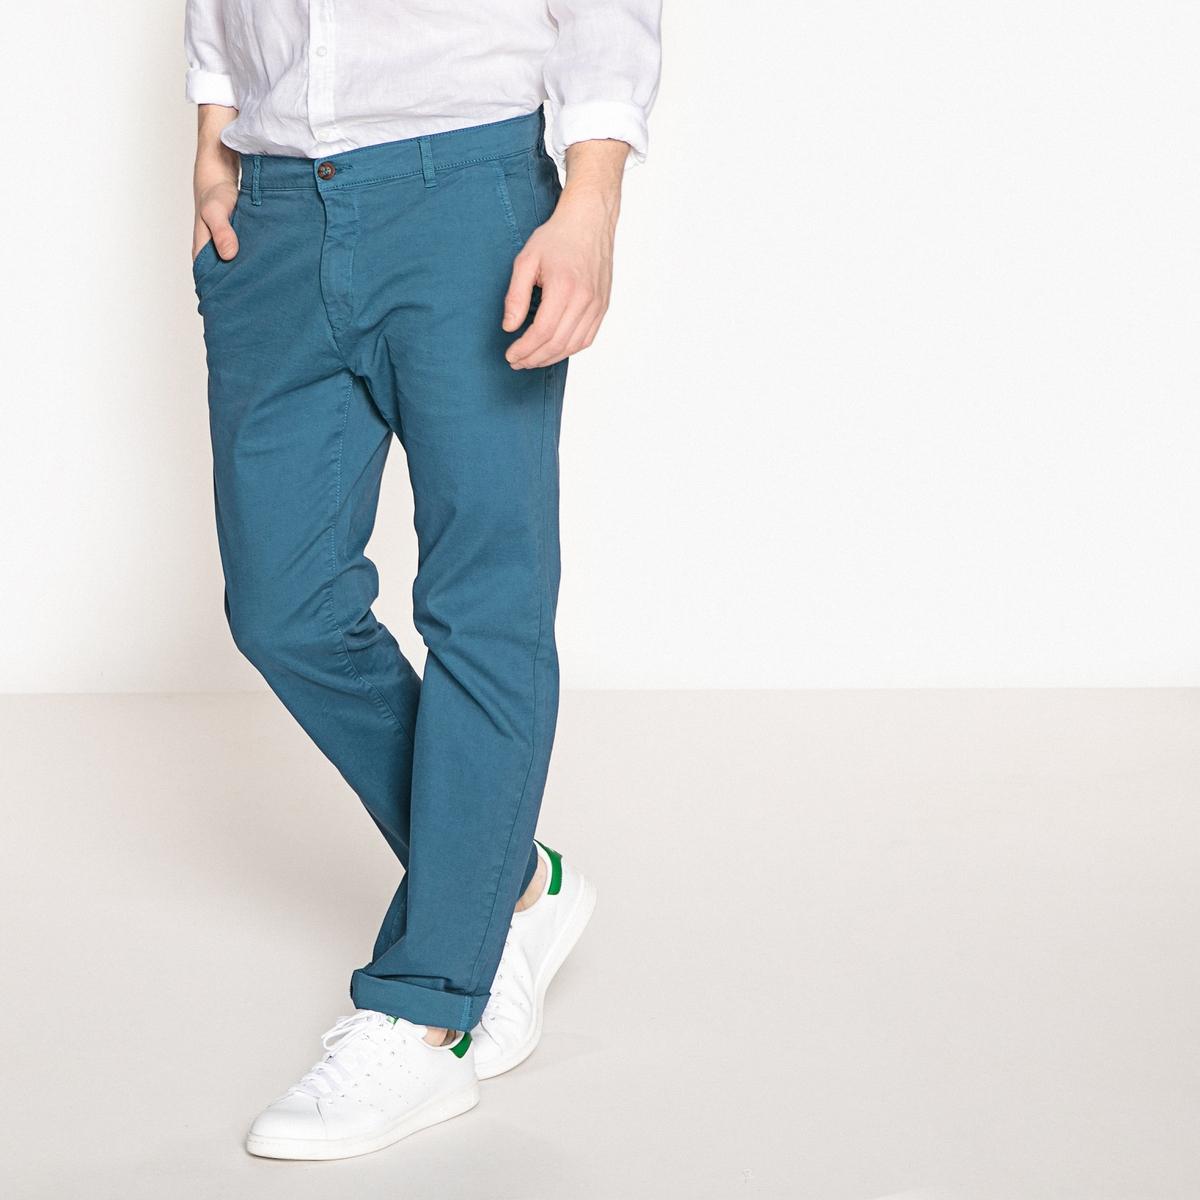 Брюки-чино La Redoute Прямого покроя ALEXIS 36 (FR) - 42 (RUS) синий брюки чино la redoute la redoute 38 fr 44 rus синий